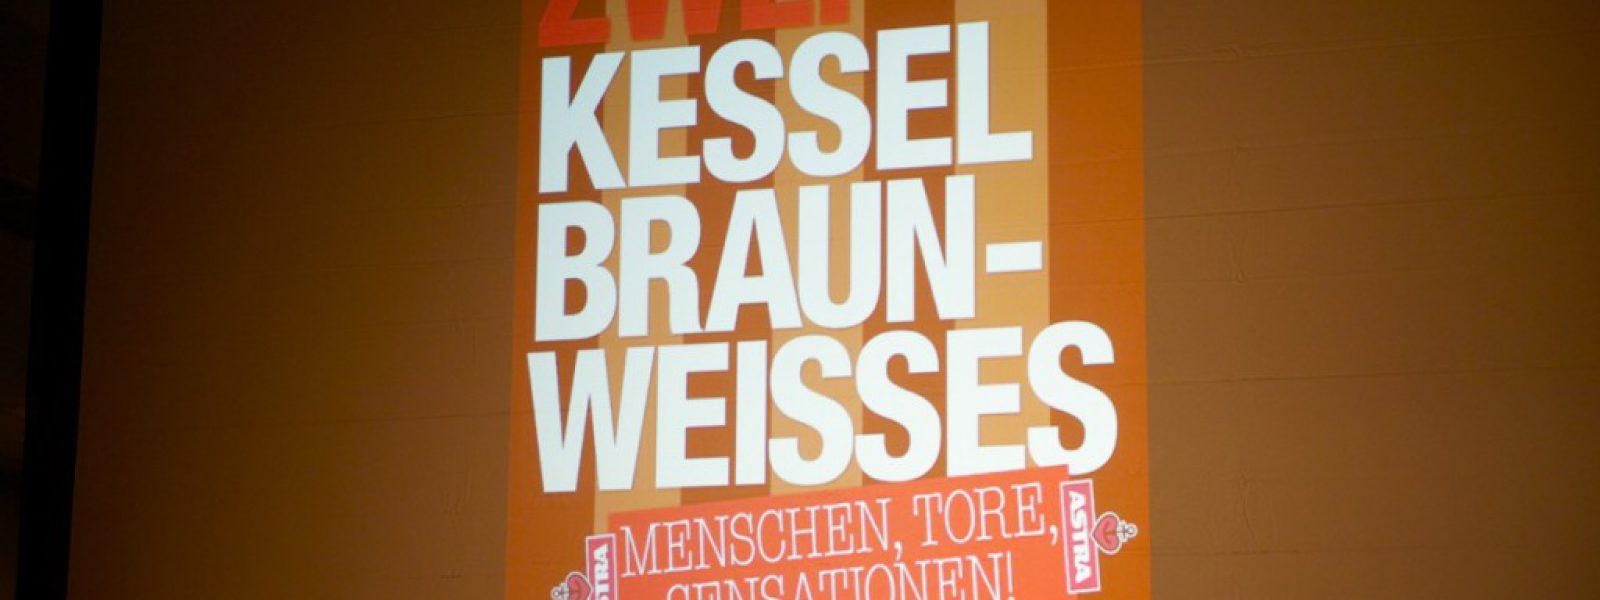 Zwei Kessel Braun Weisses (Foto Sabrina Adeline Nagel)_01